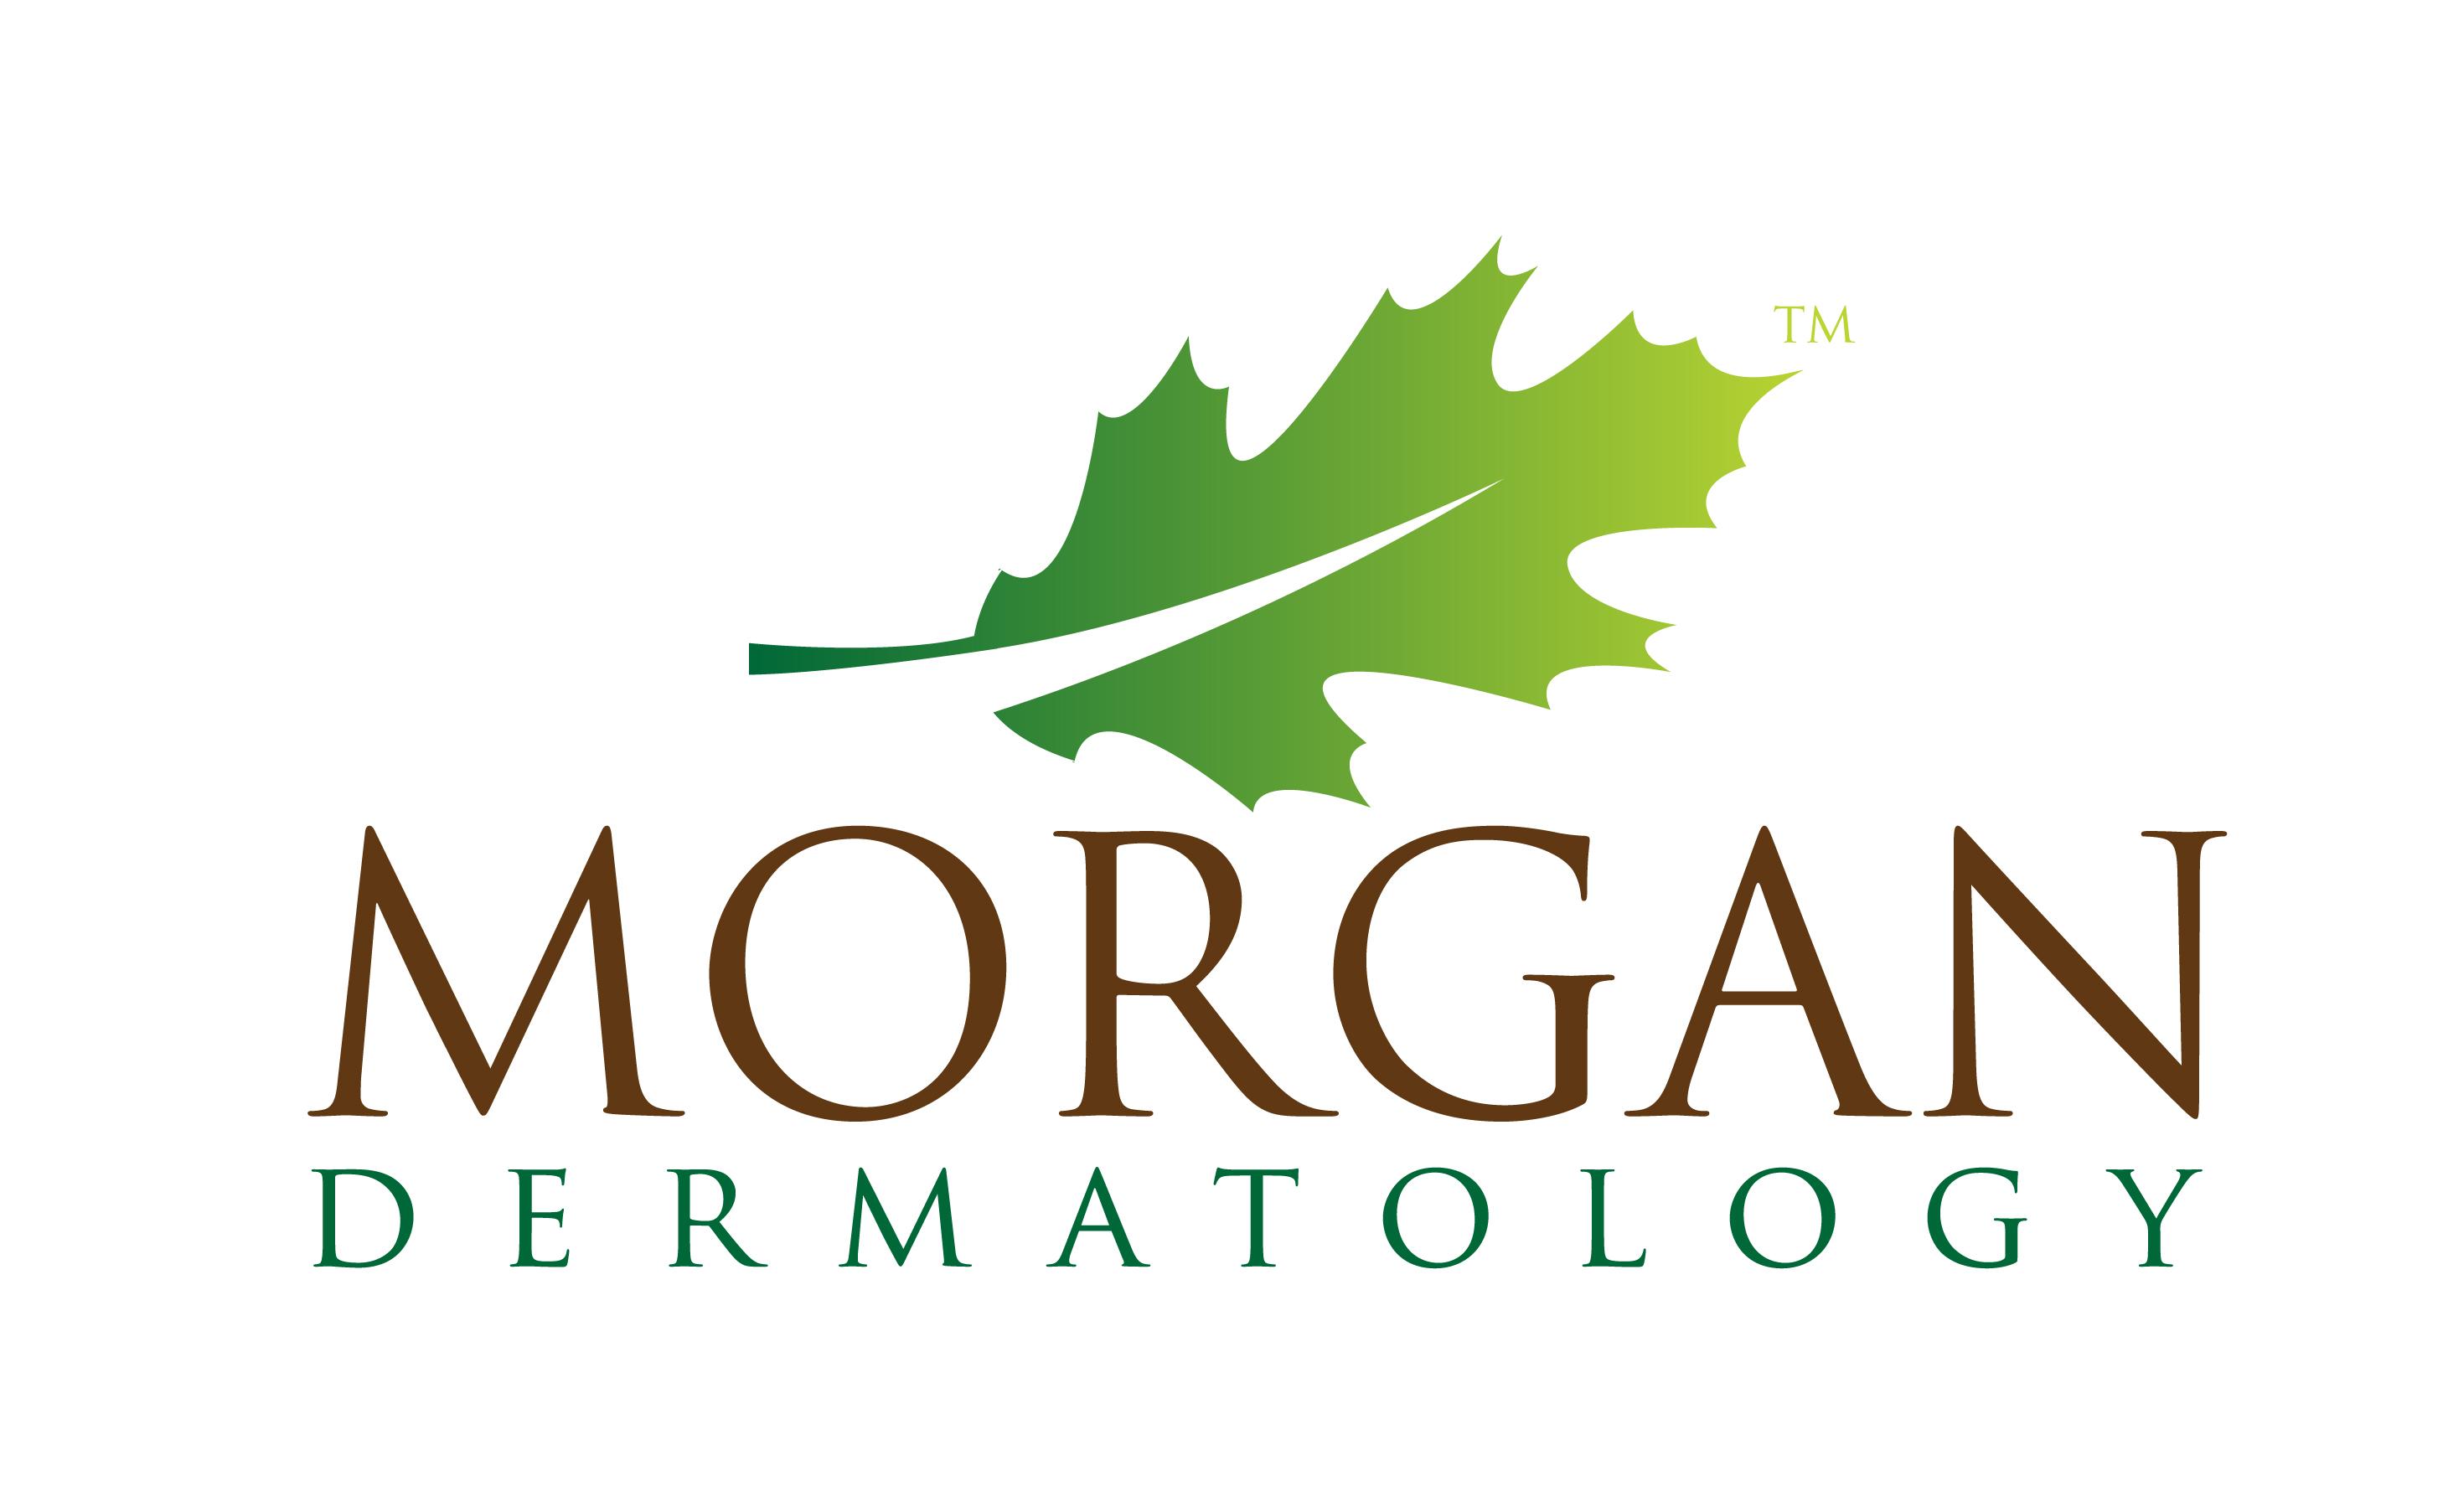 Morgan Dermatology Ocean Nj 07712 732 508 9390